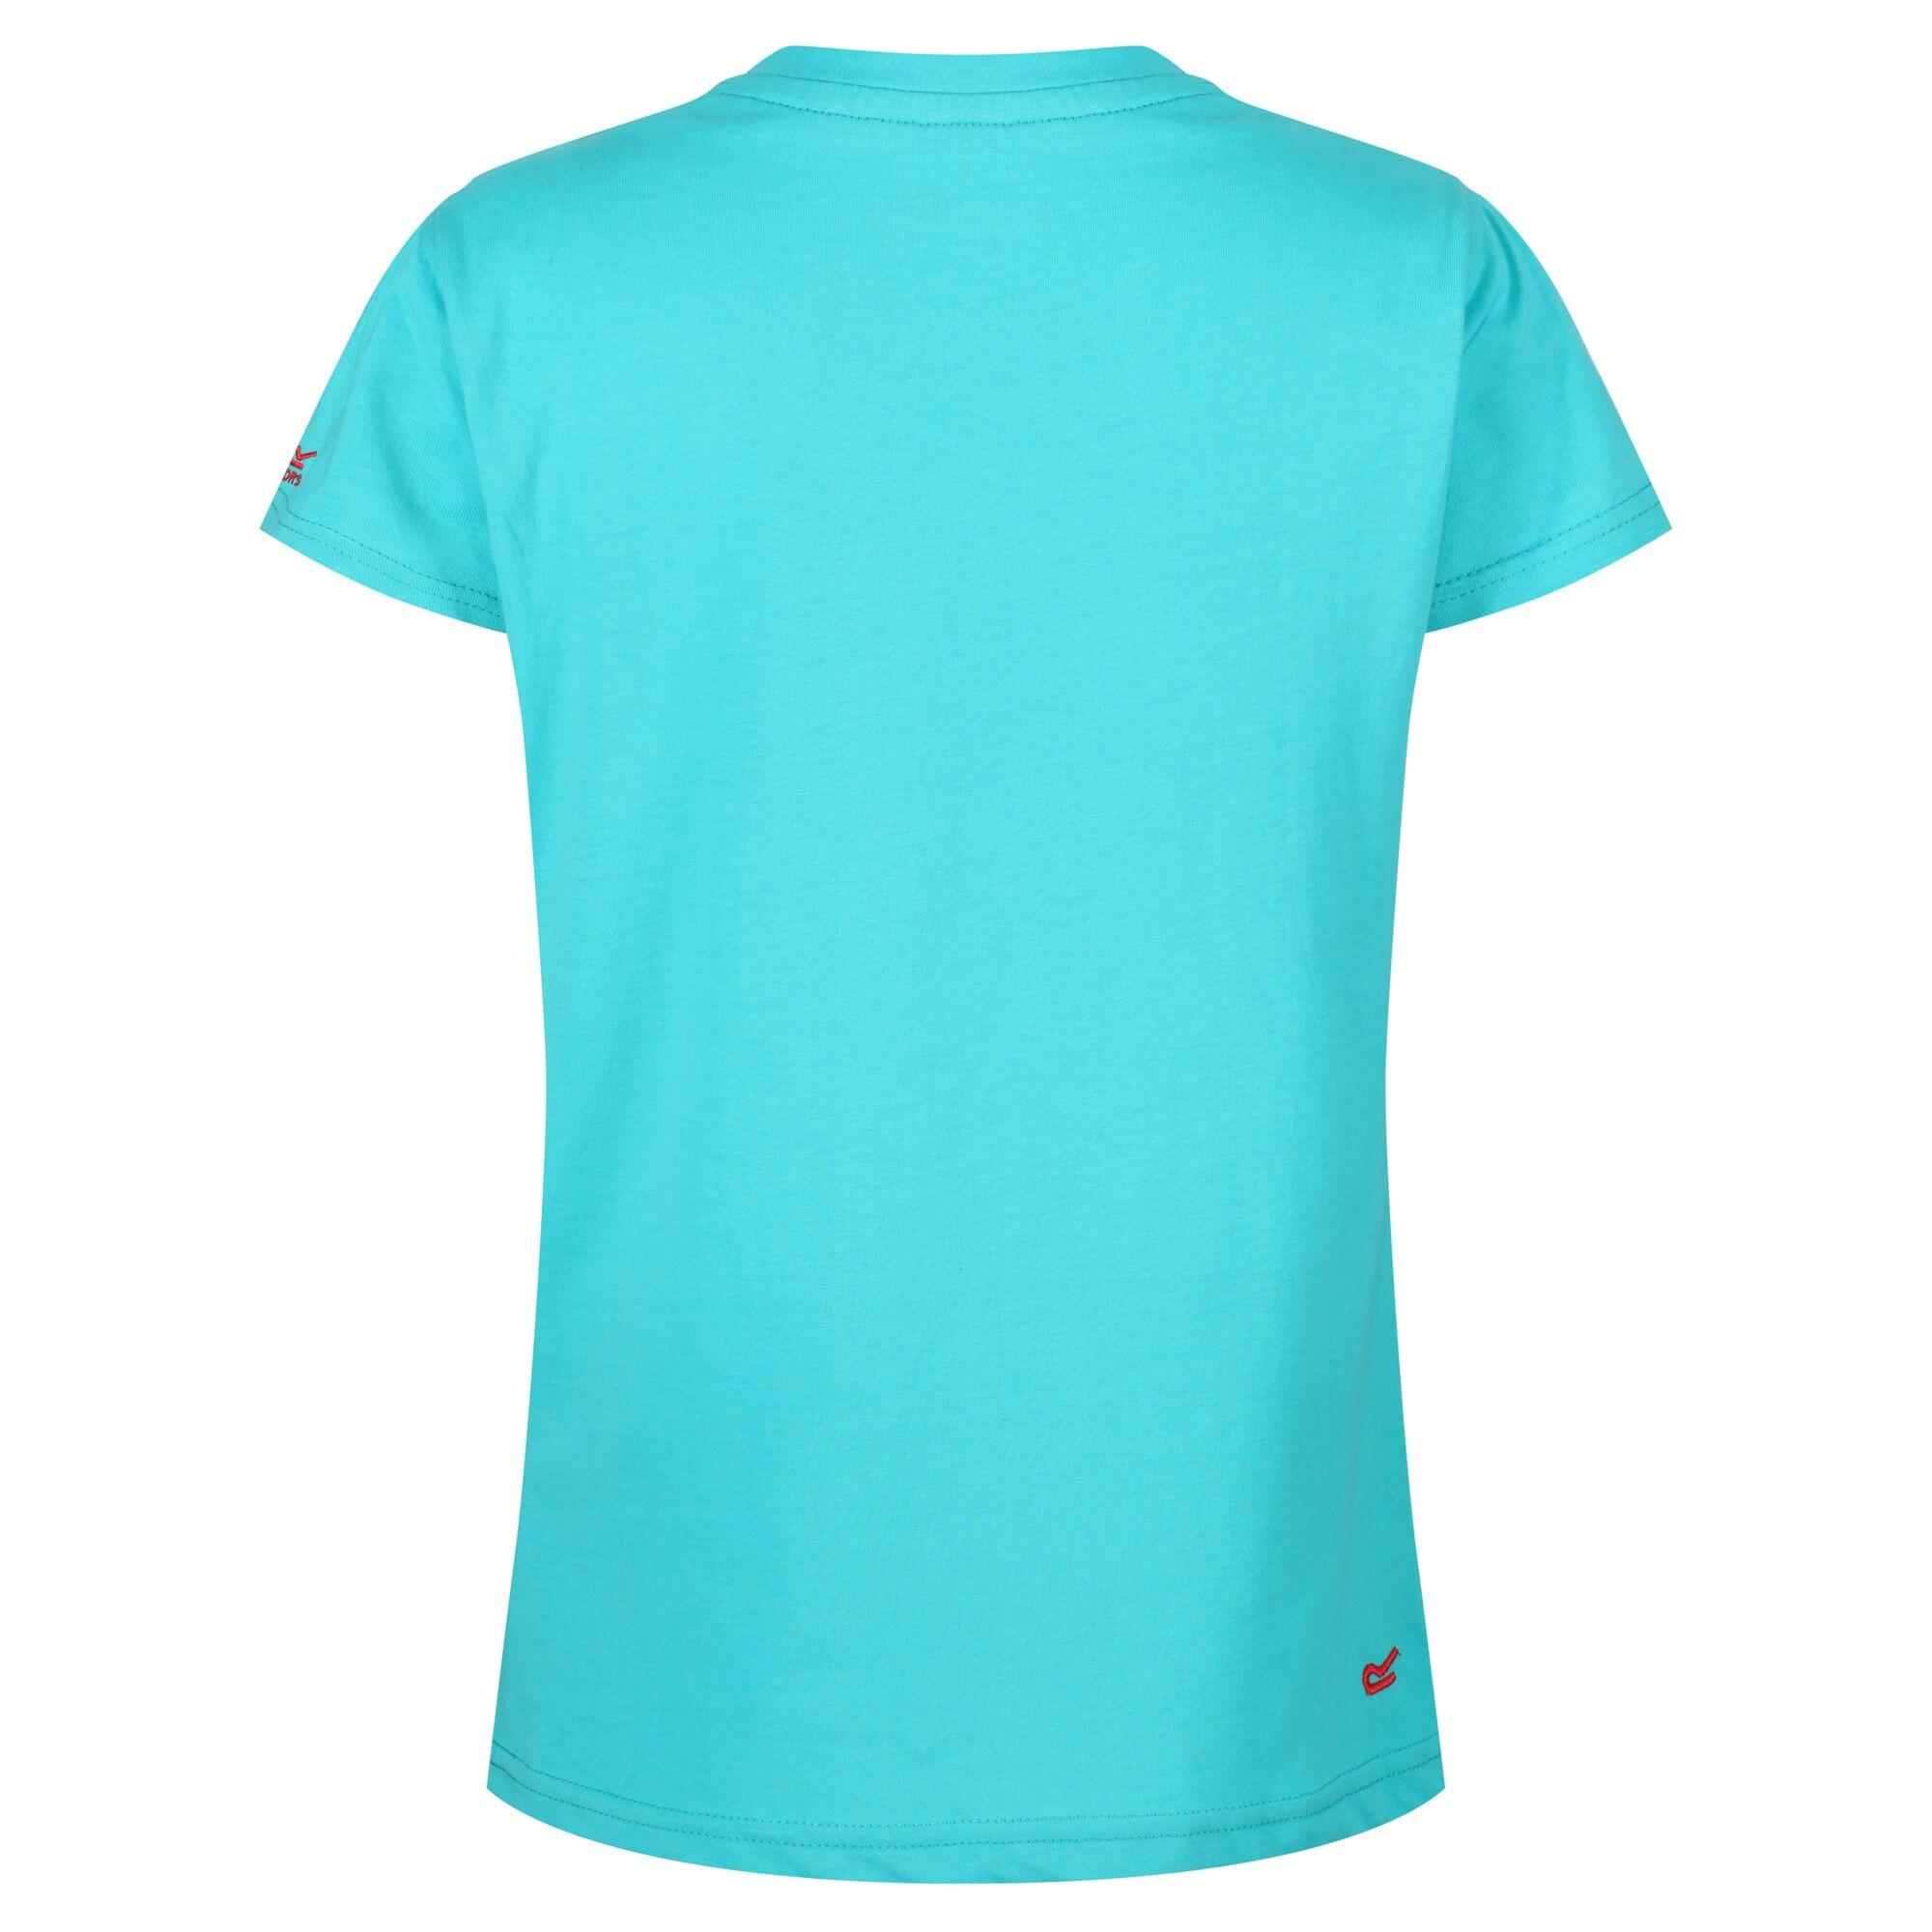 Regatta Kids/' Bosley II Graphic Print T-Shirt Blue